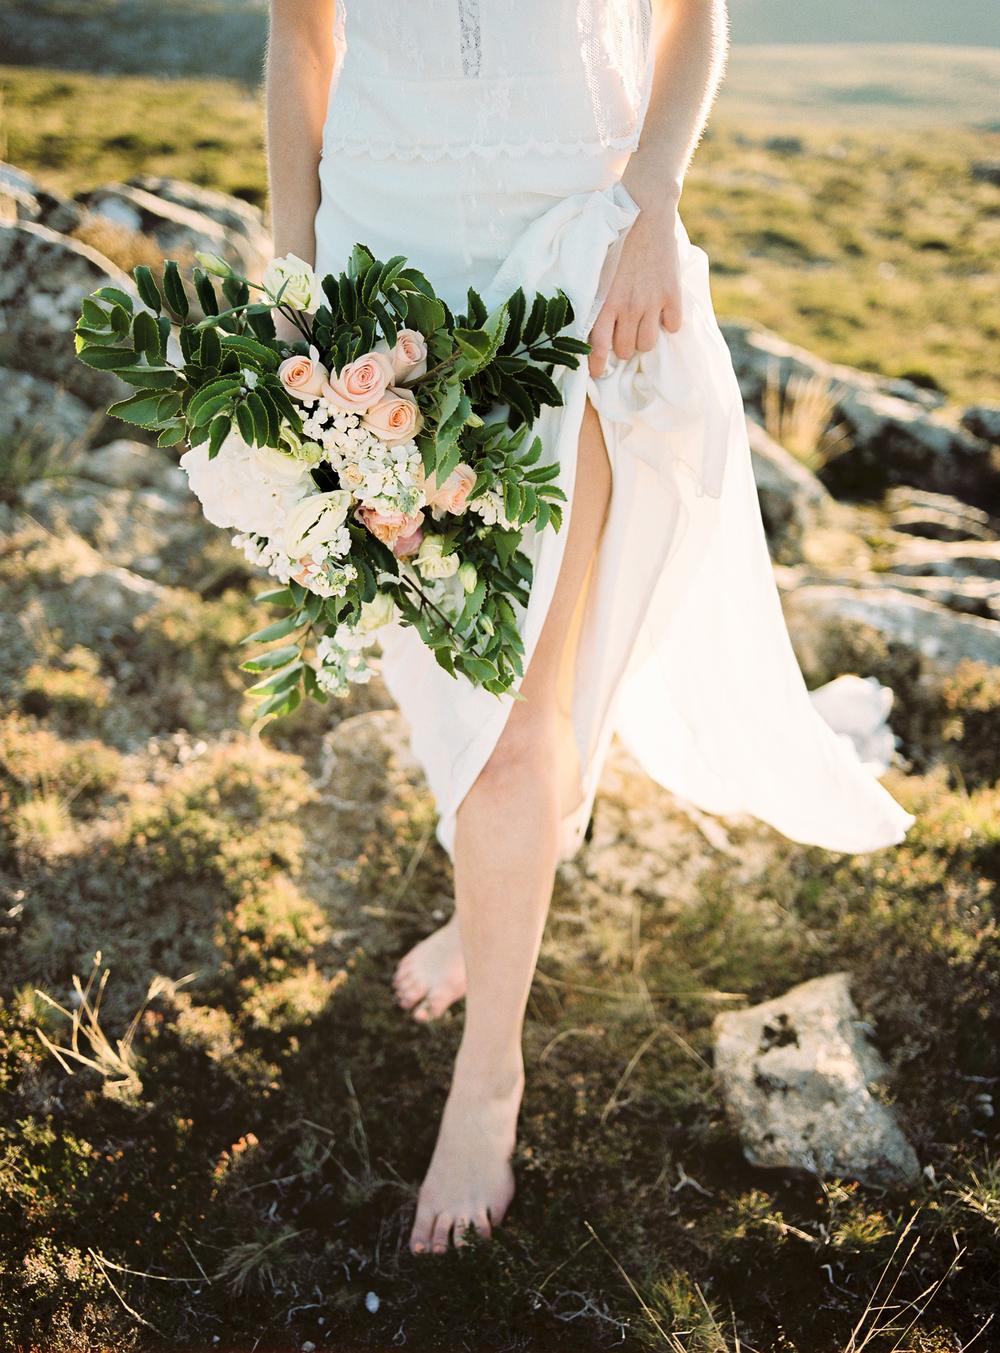 Barefoot Boho Bride - Rembo Styling - ©Celine Chhuon